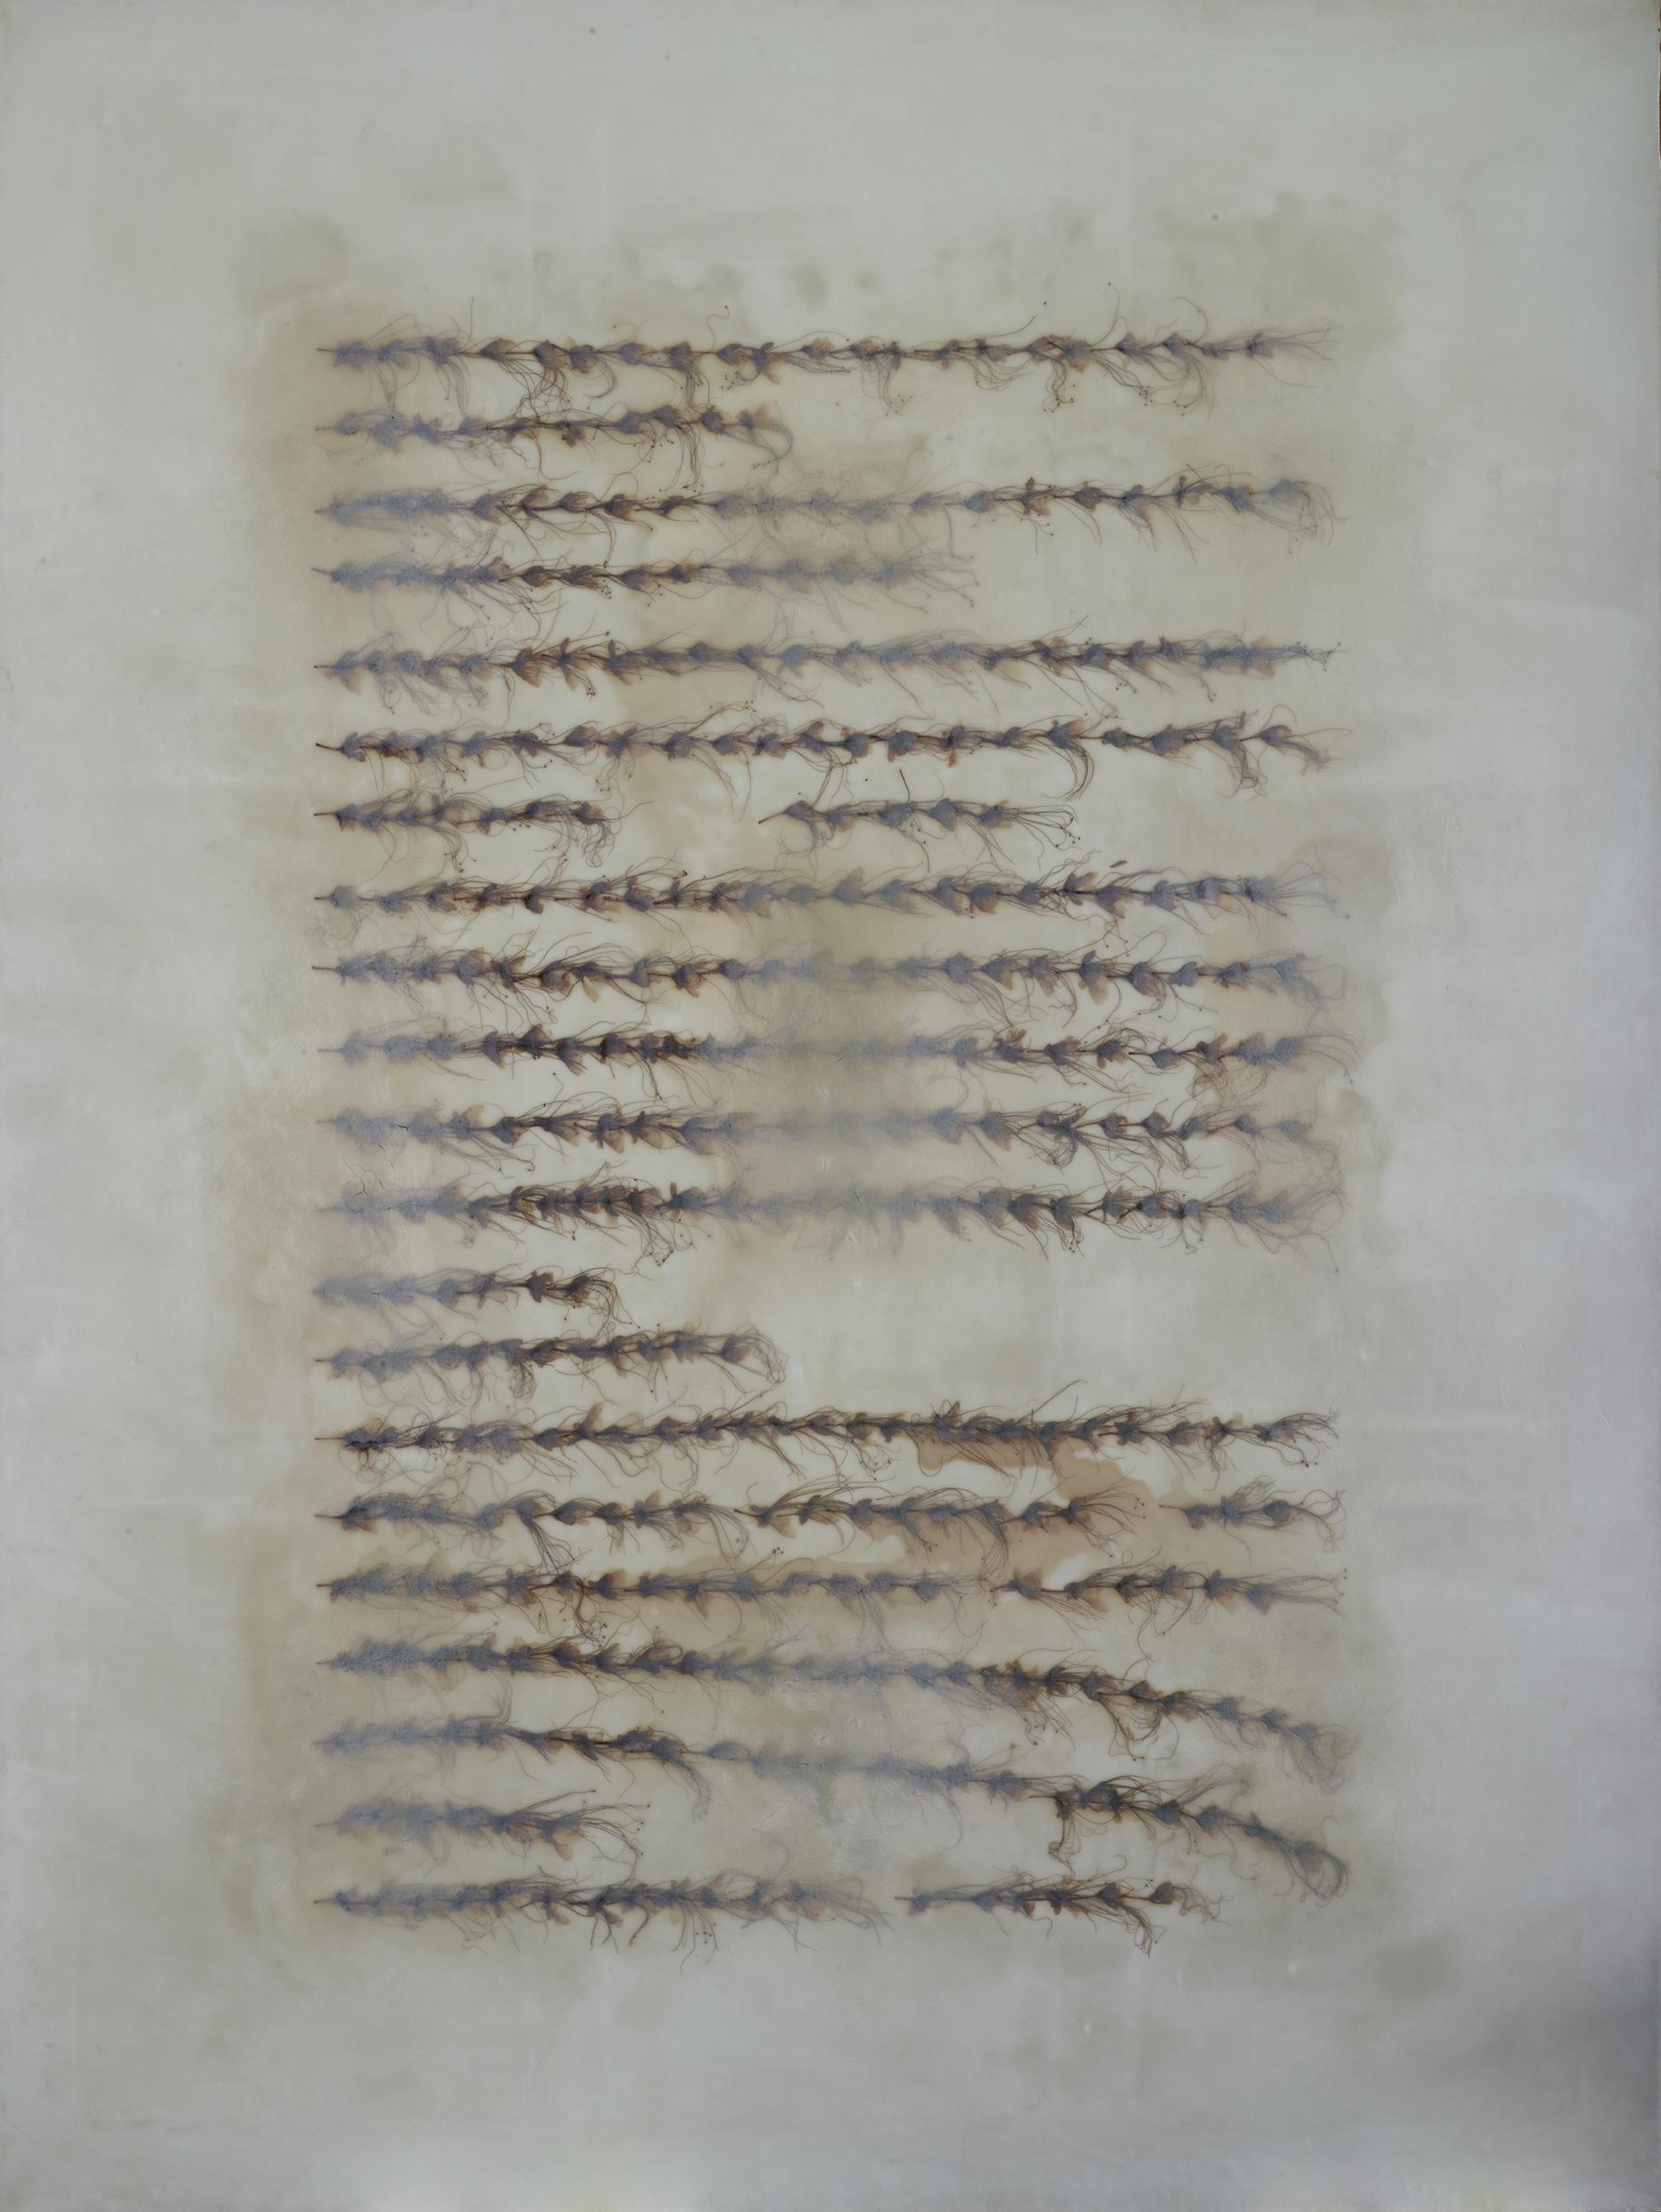 Tayfun Erdoğmuş, Untitled 2008